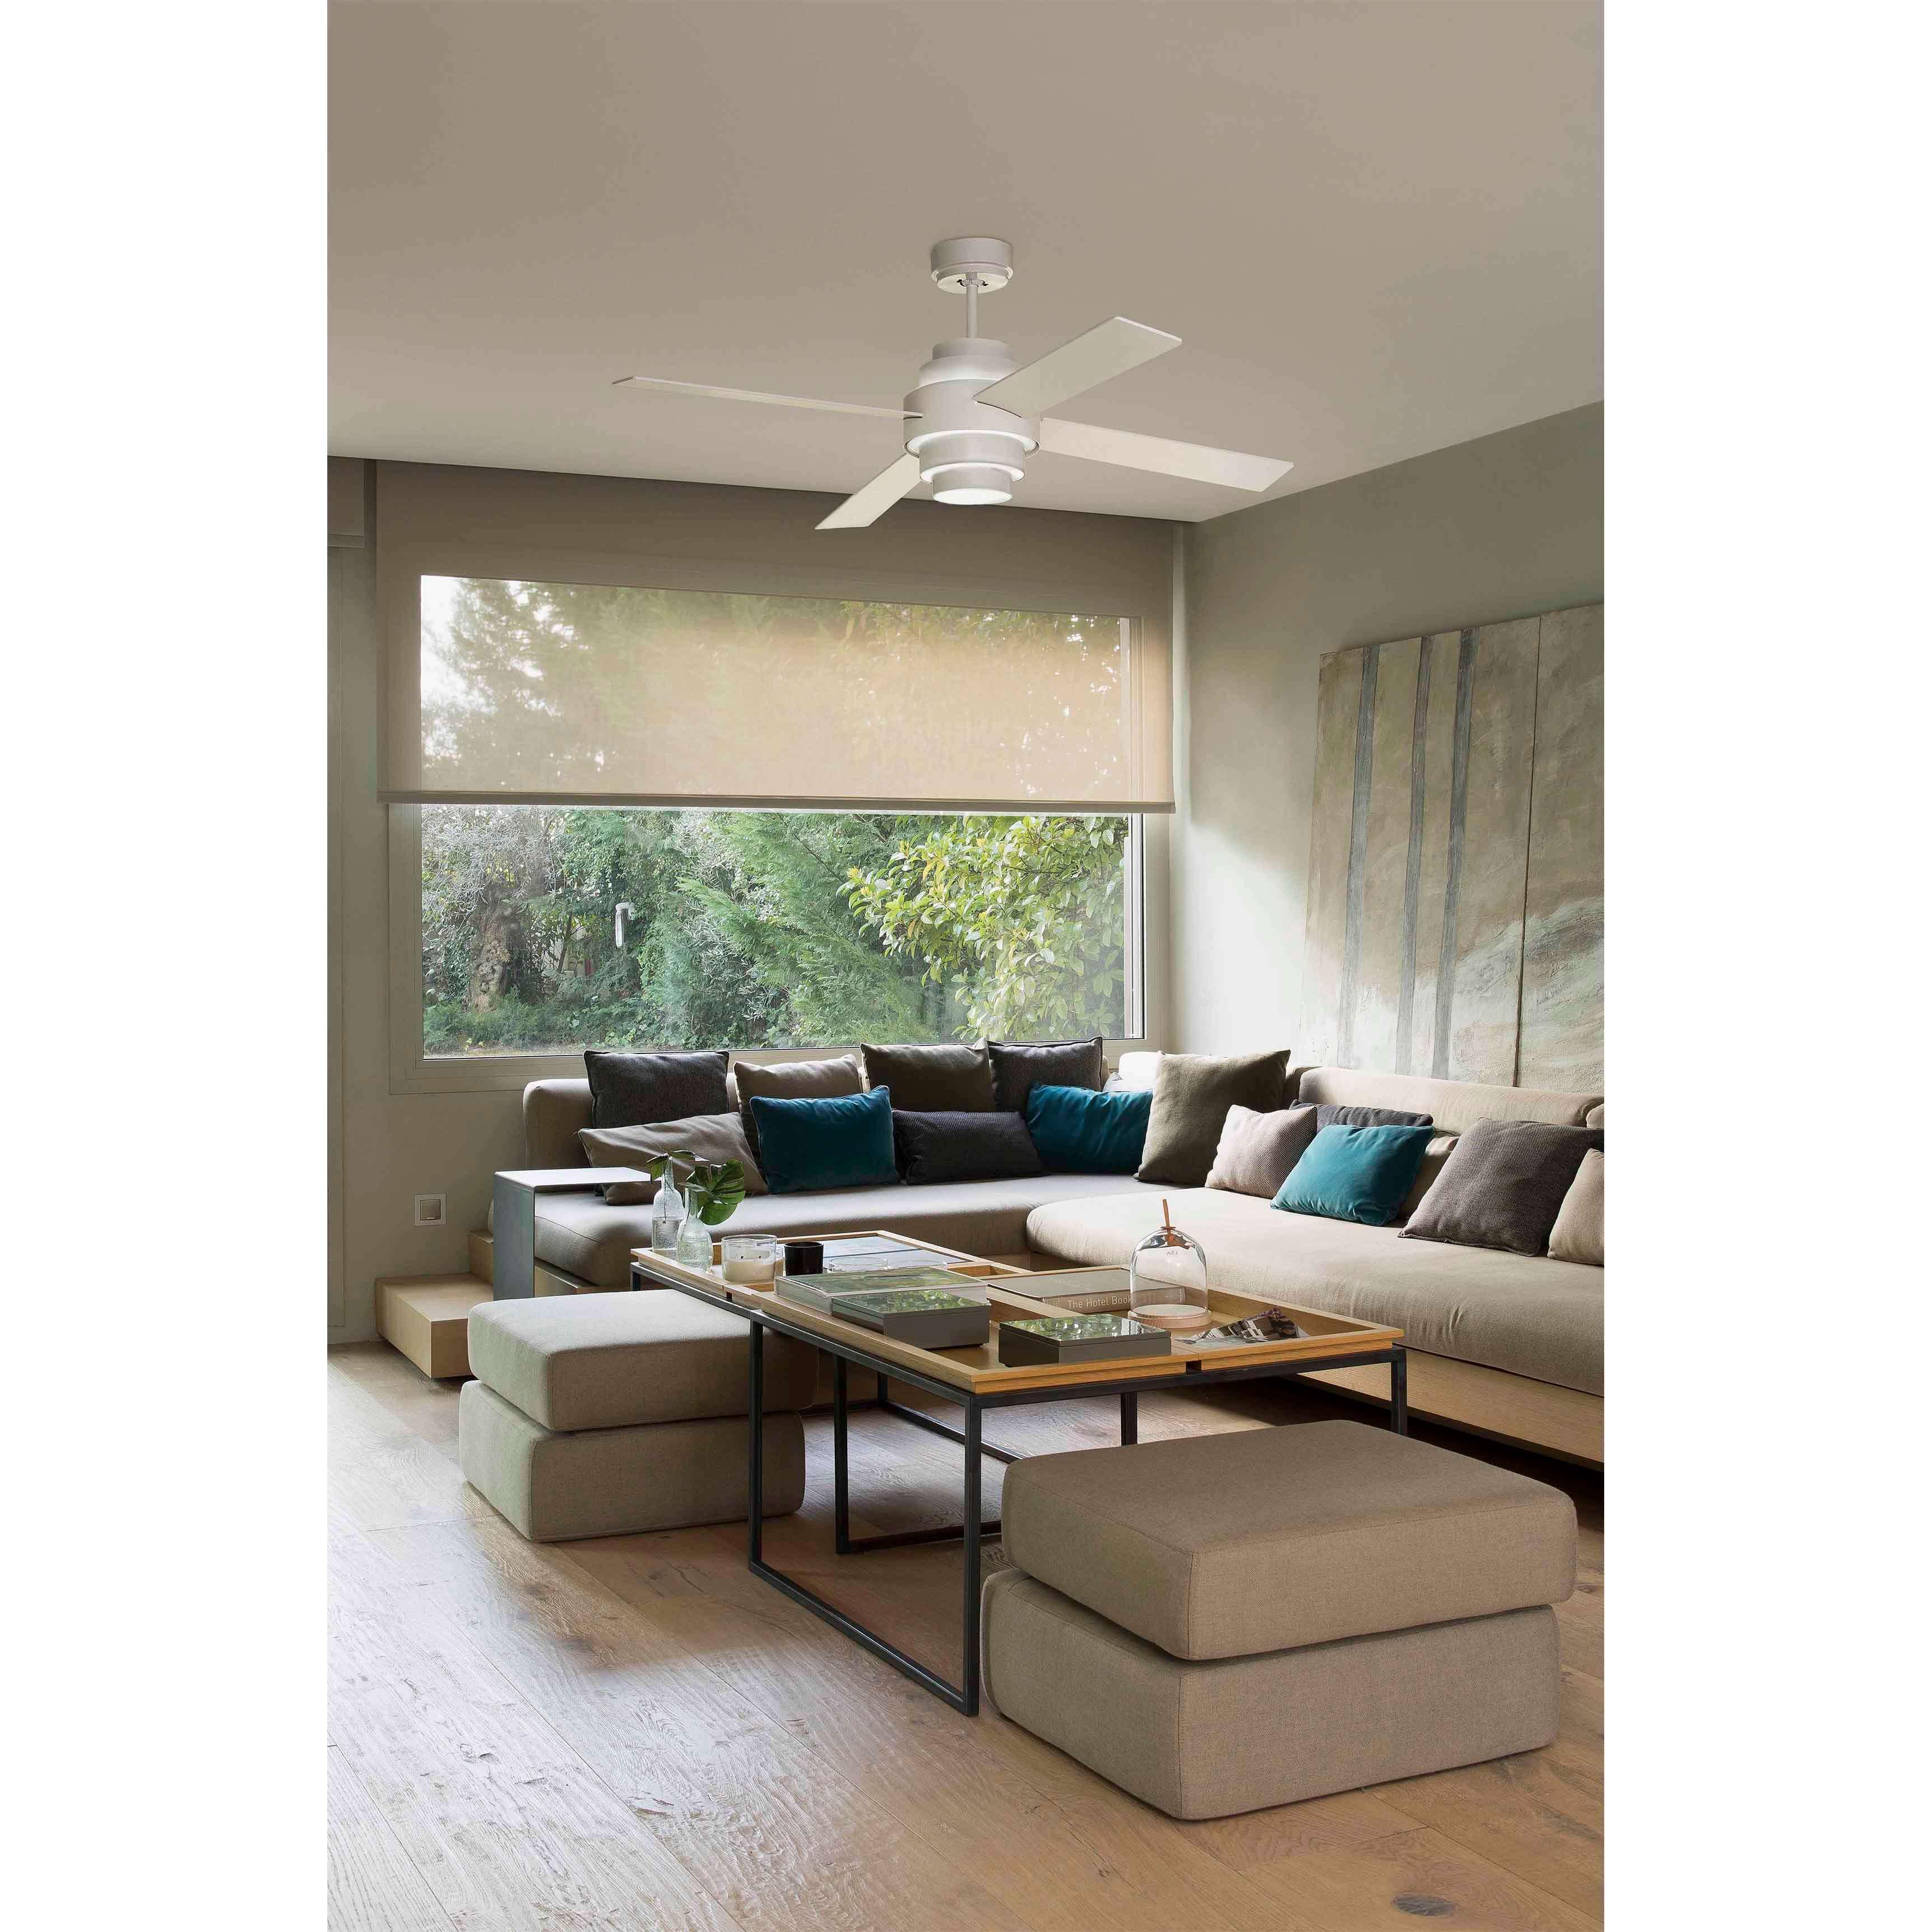 energiespar deckenventilator disc wei 132 cm mit led. Black Bedroom Furniture Sets. Home Design Ideas